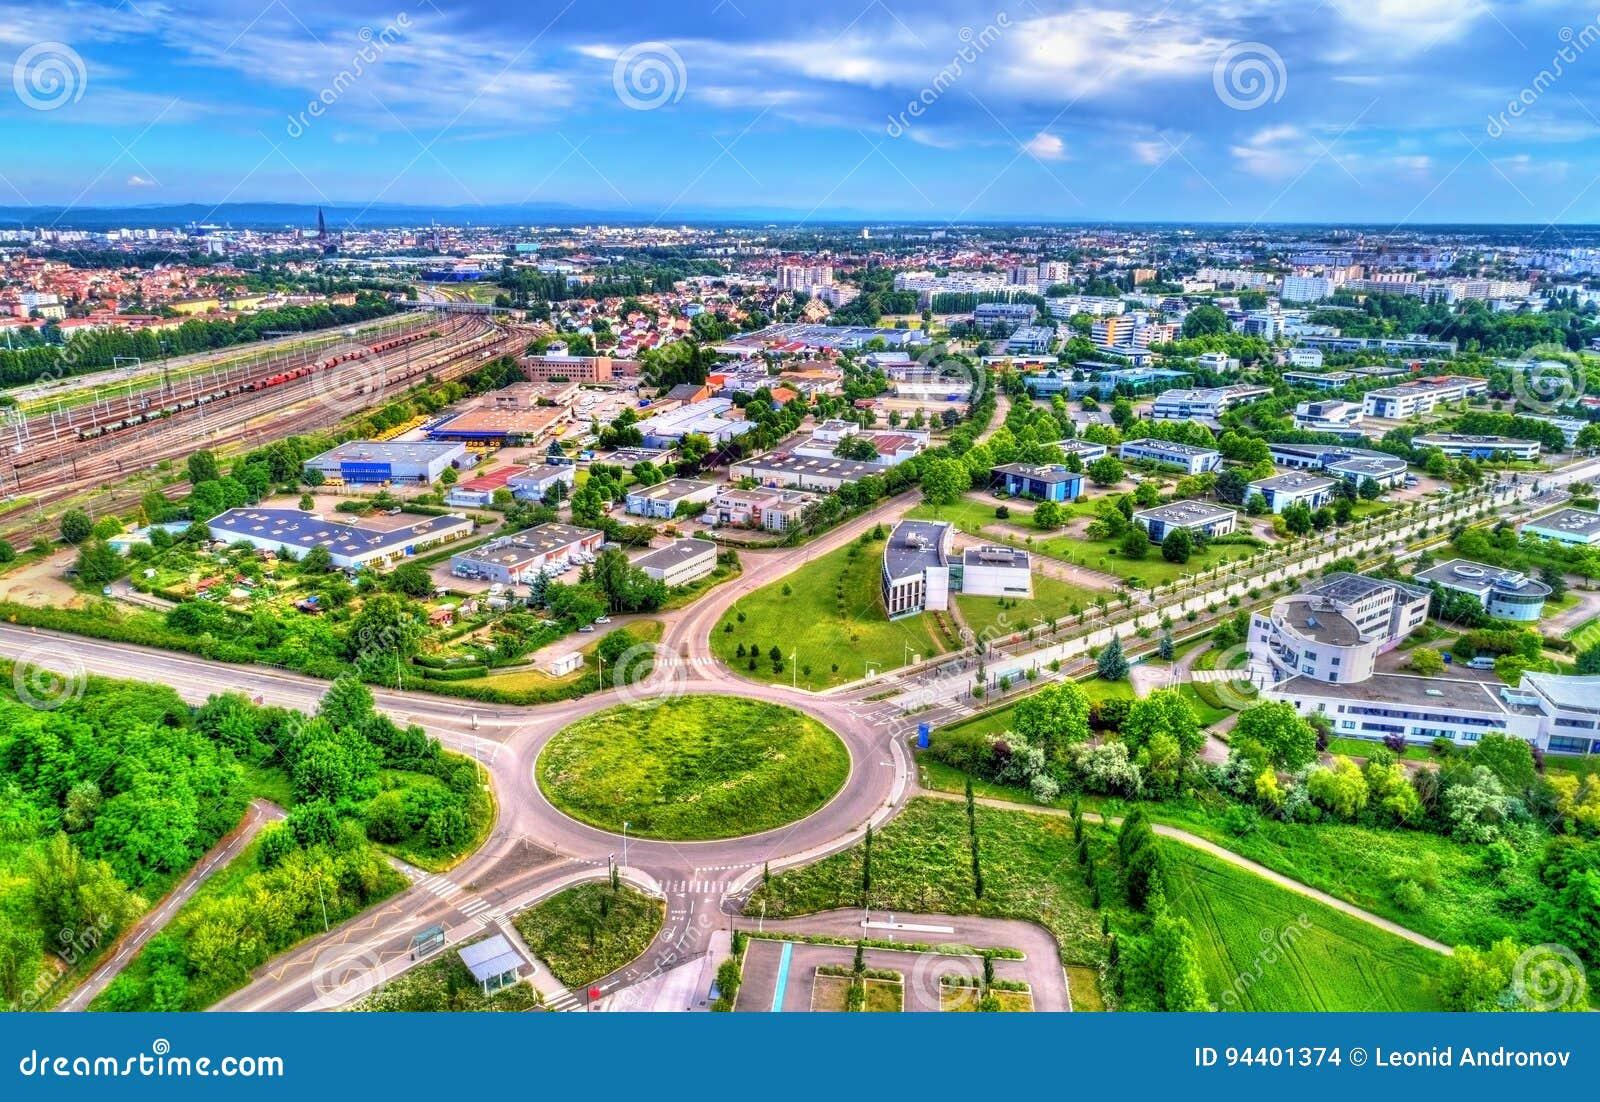 Widok z lotu ptaka rondo w Schiltigheim blisko Strasburg, Francja